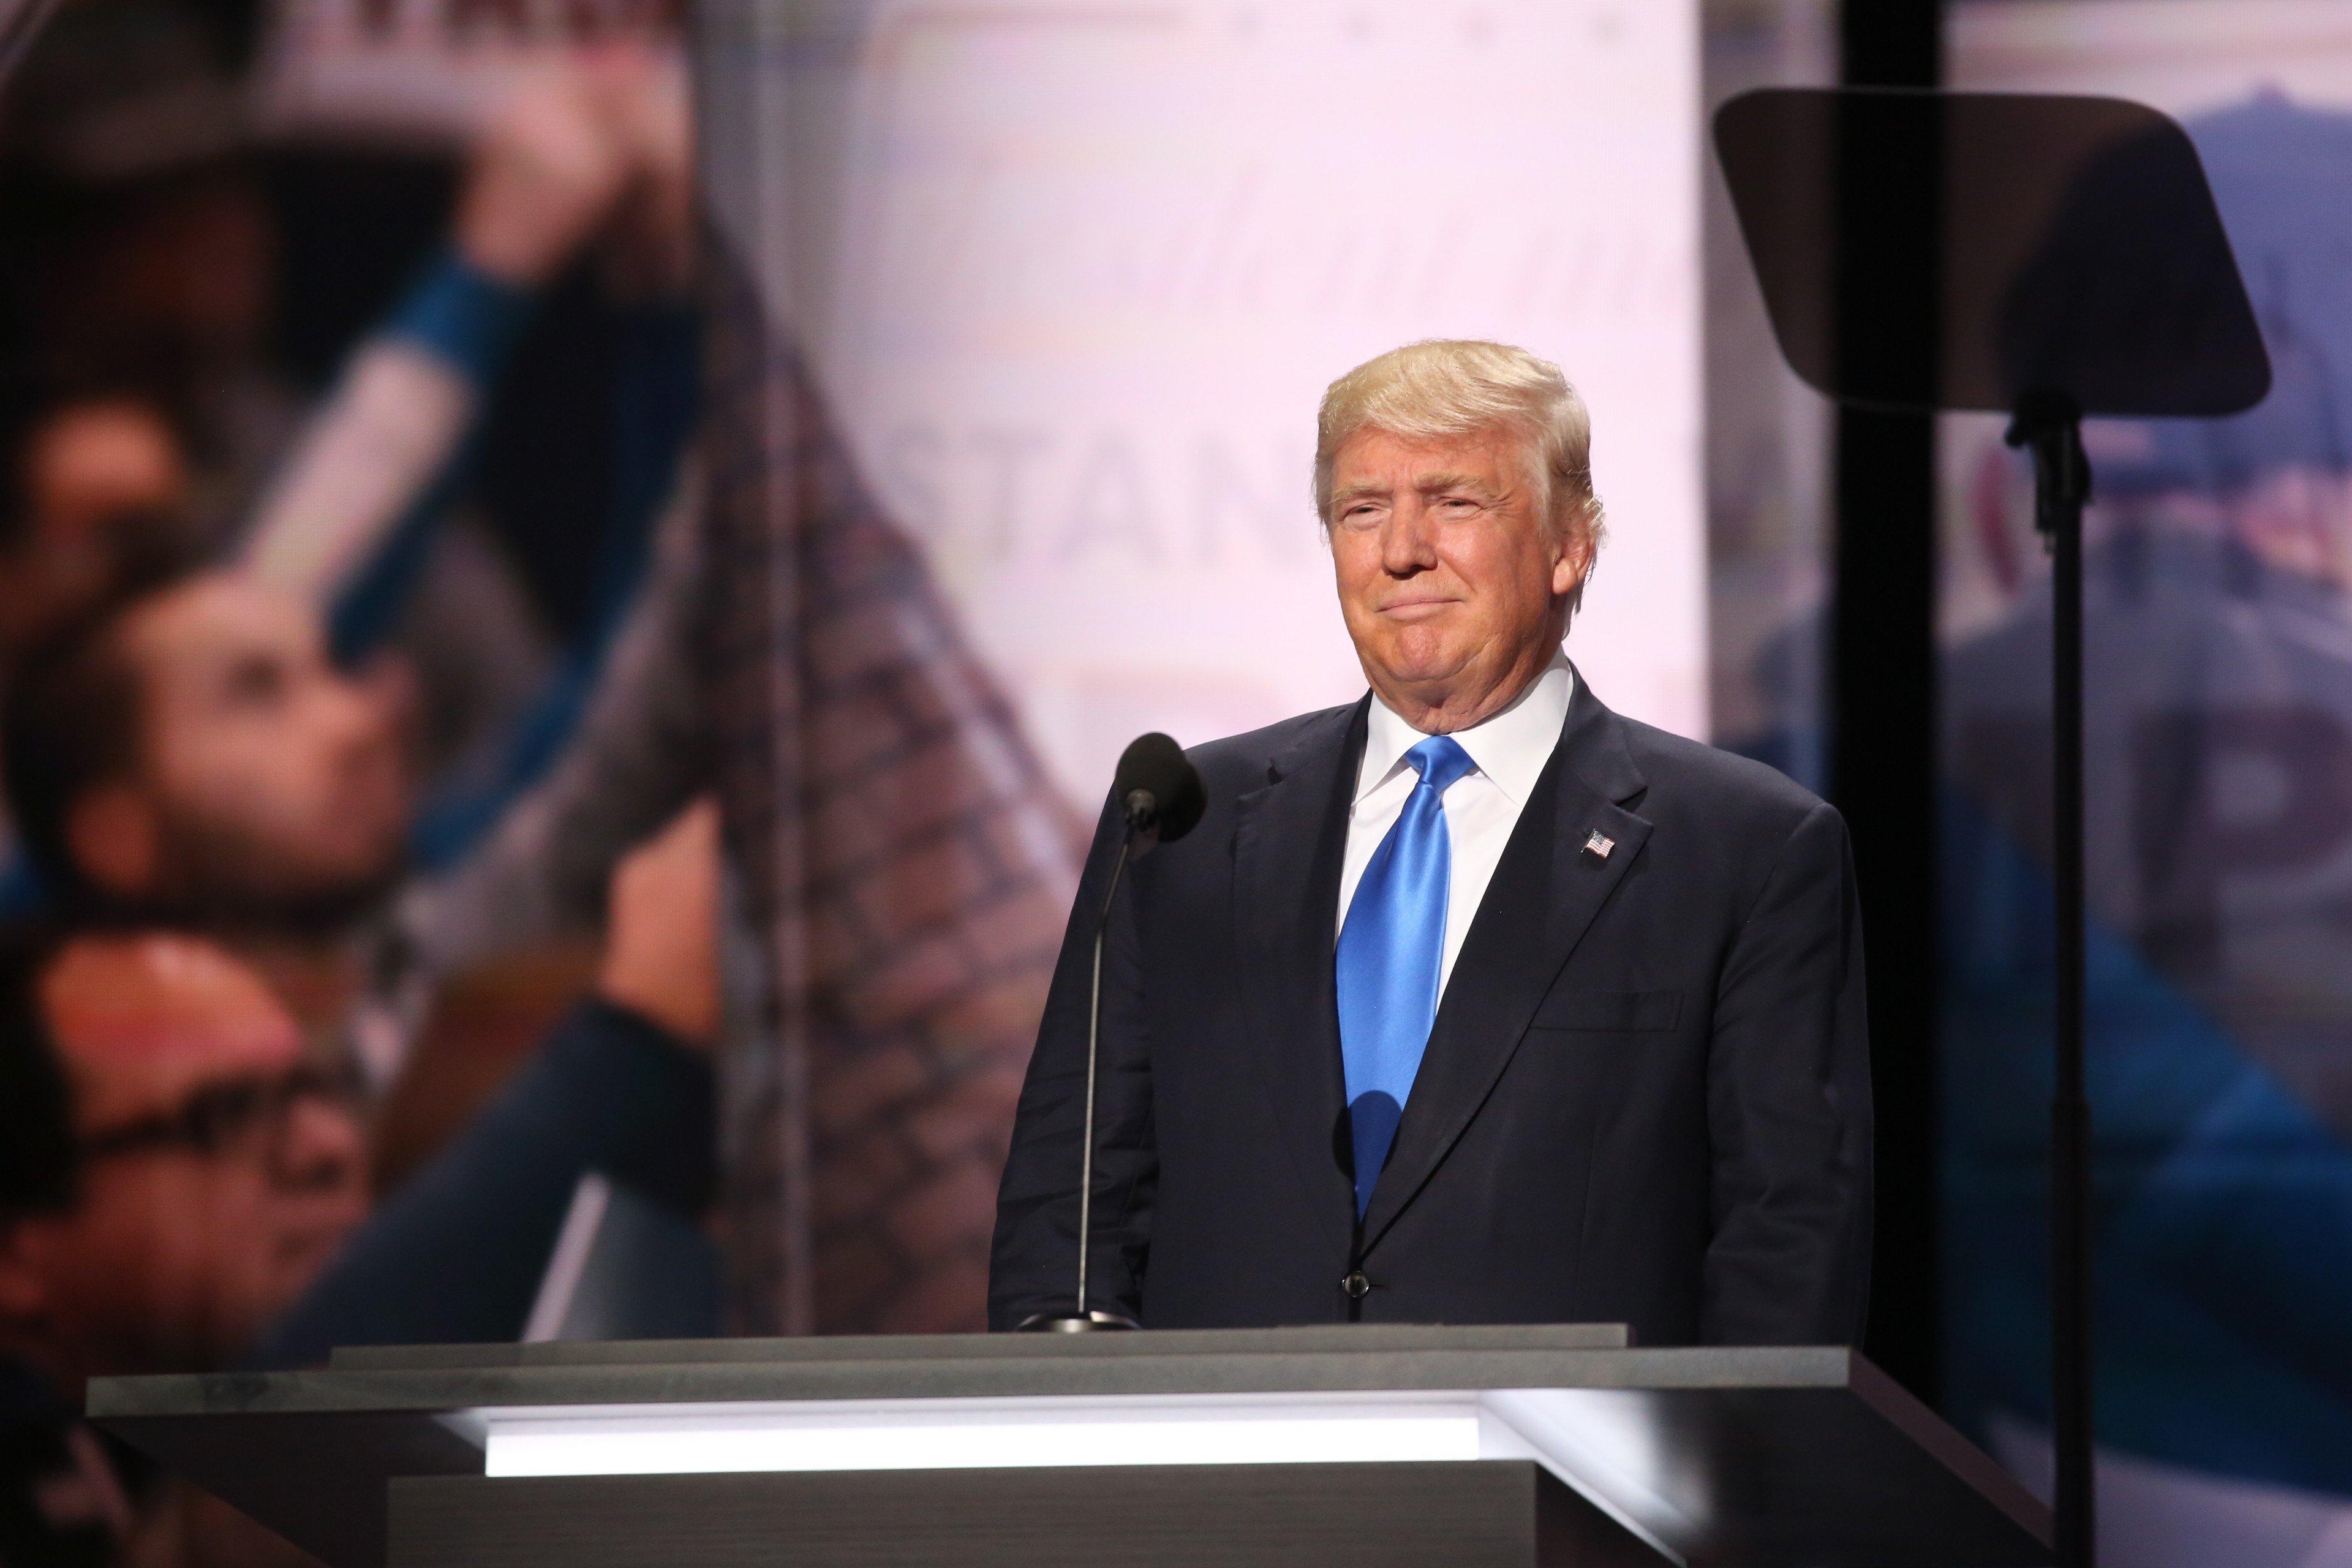 Quinnipiac poll: Clinton's lead over Trump rises to 7 points